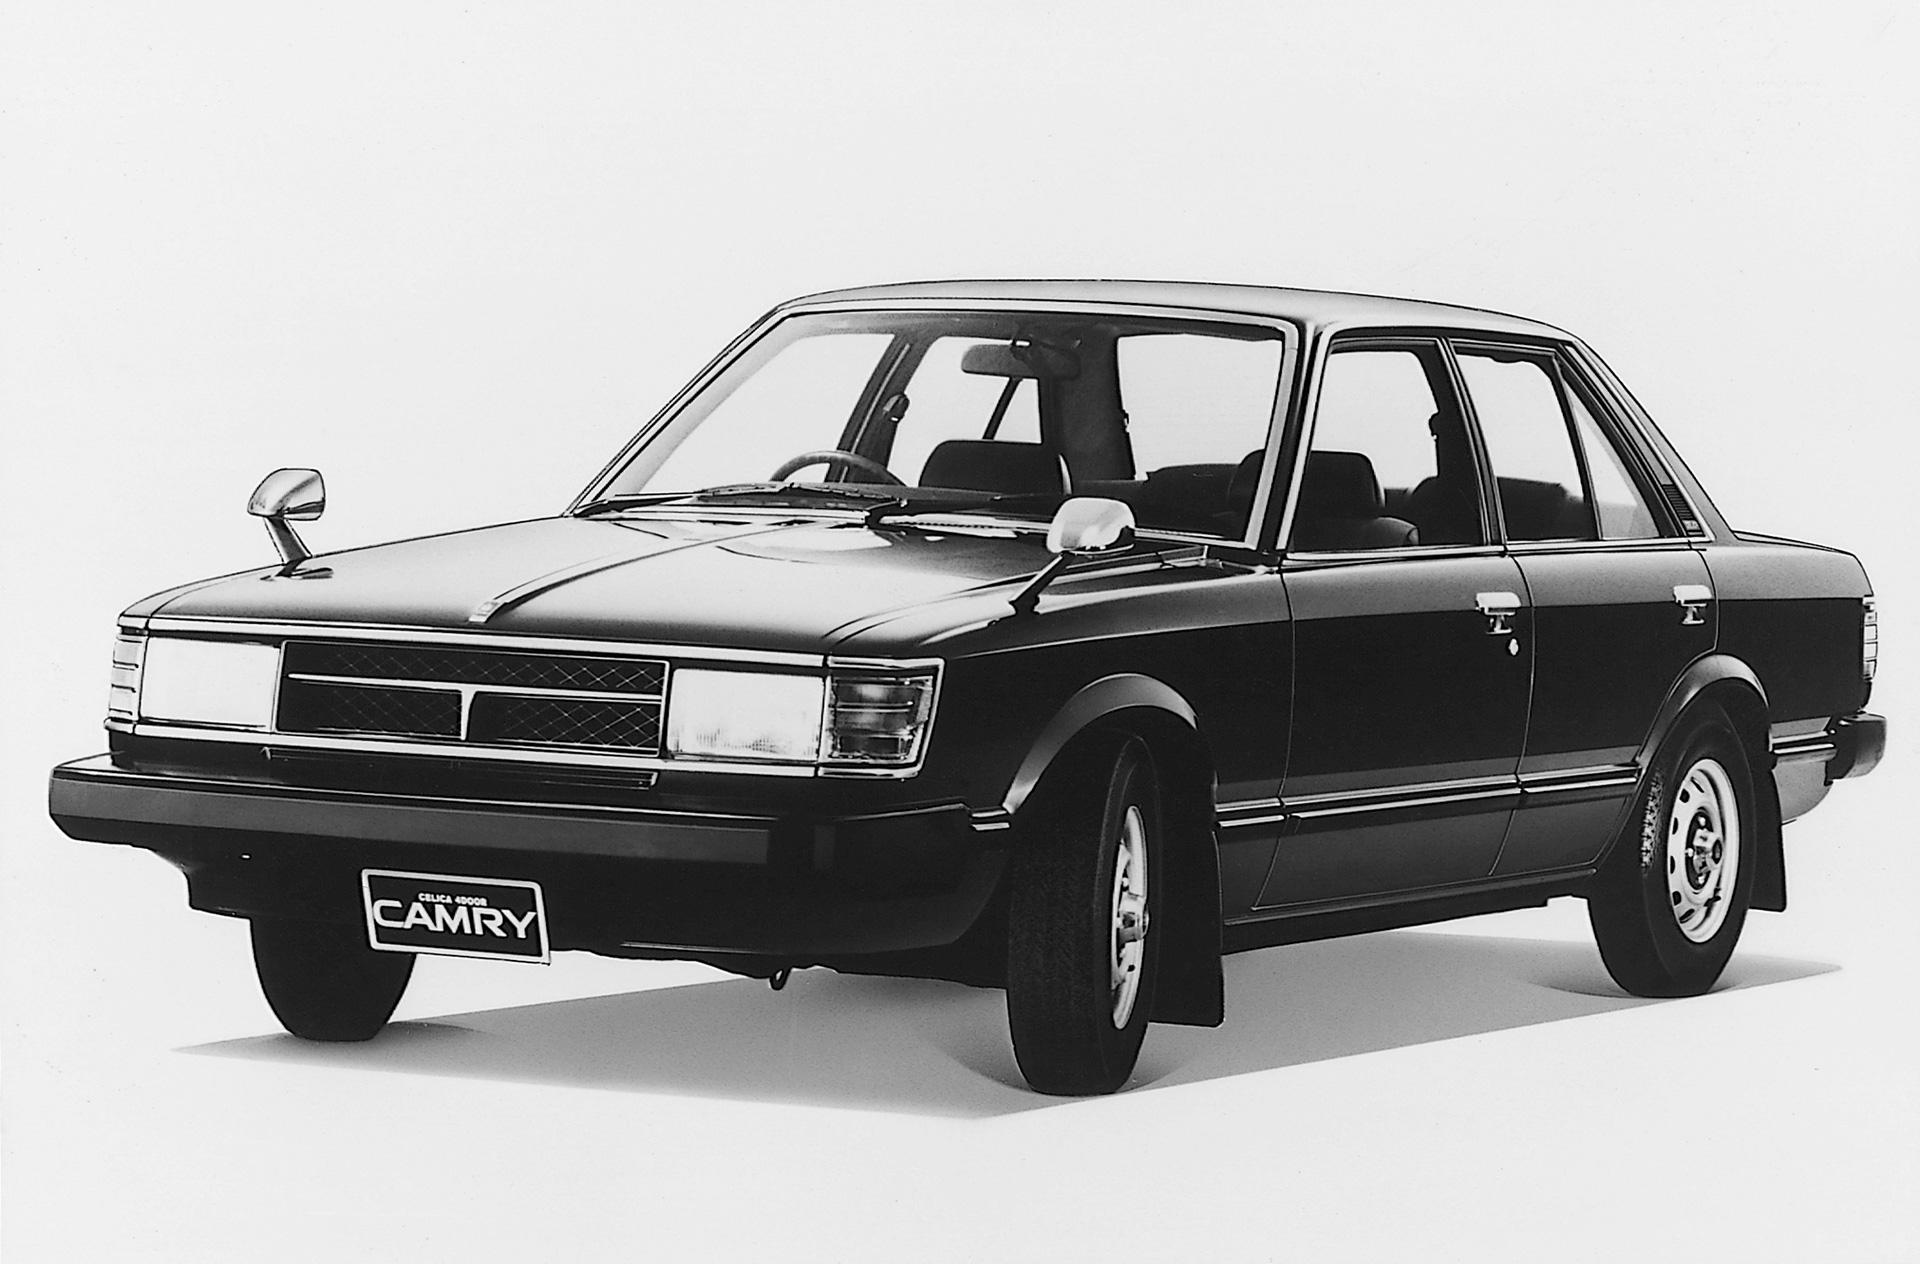 Toyota Camry 1980